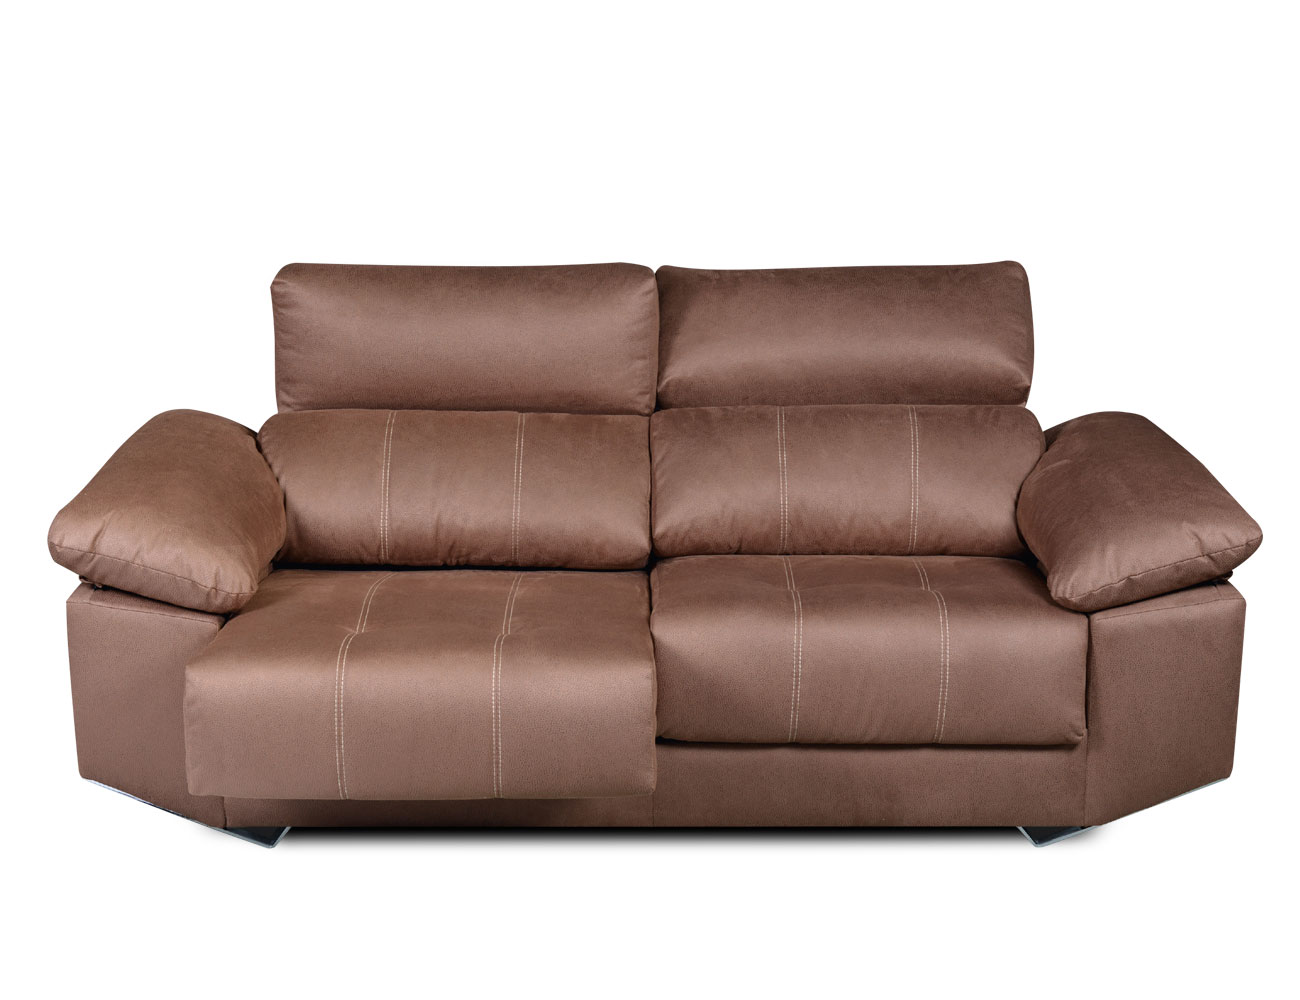 Sofa 3 plazas moderno tejido anti manchas 21